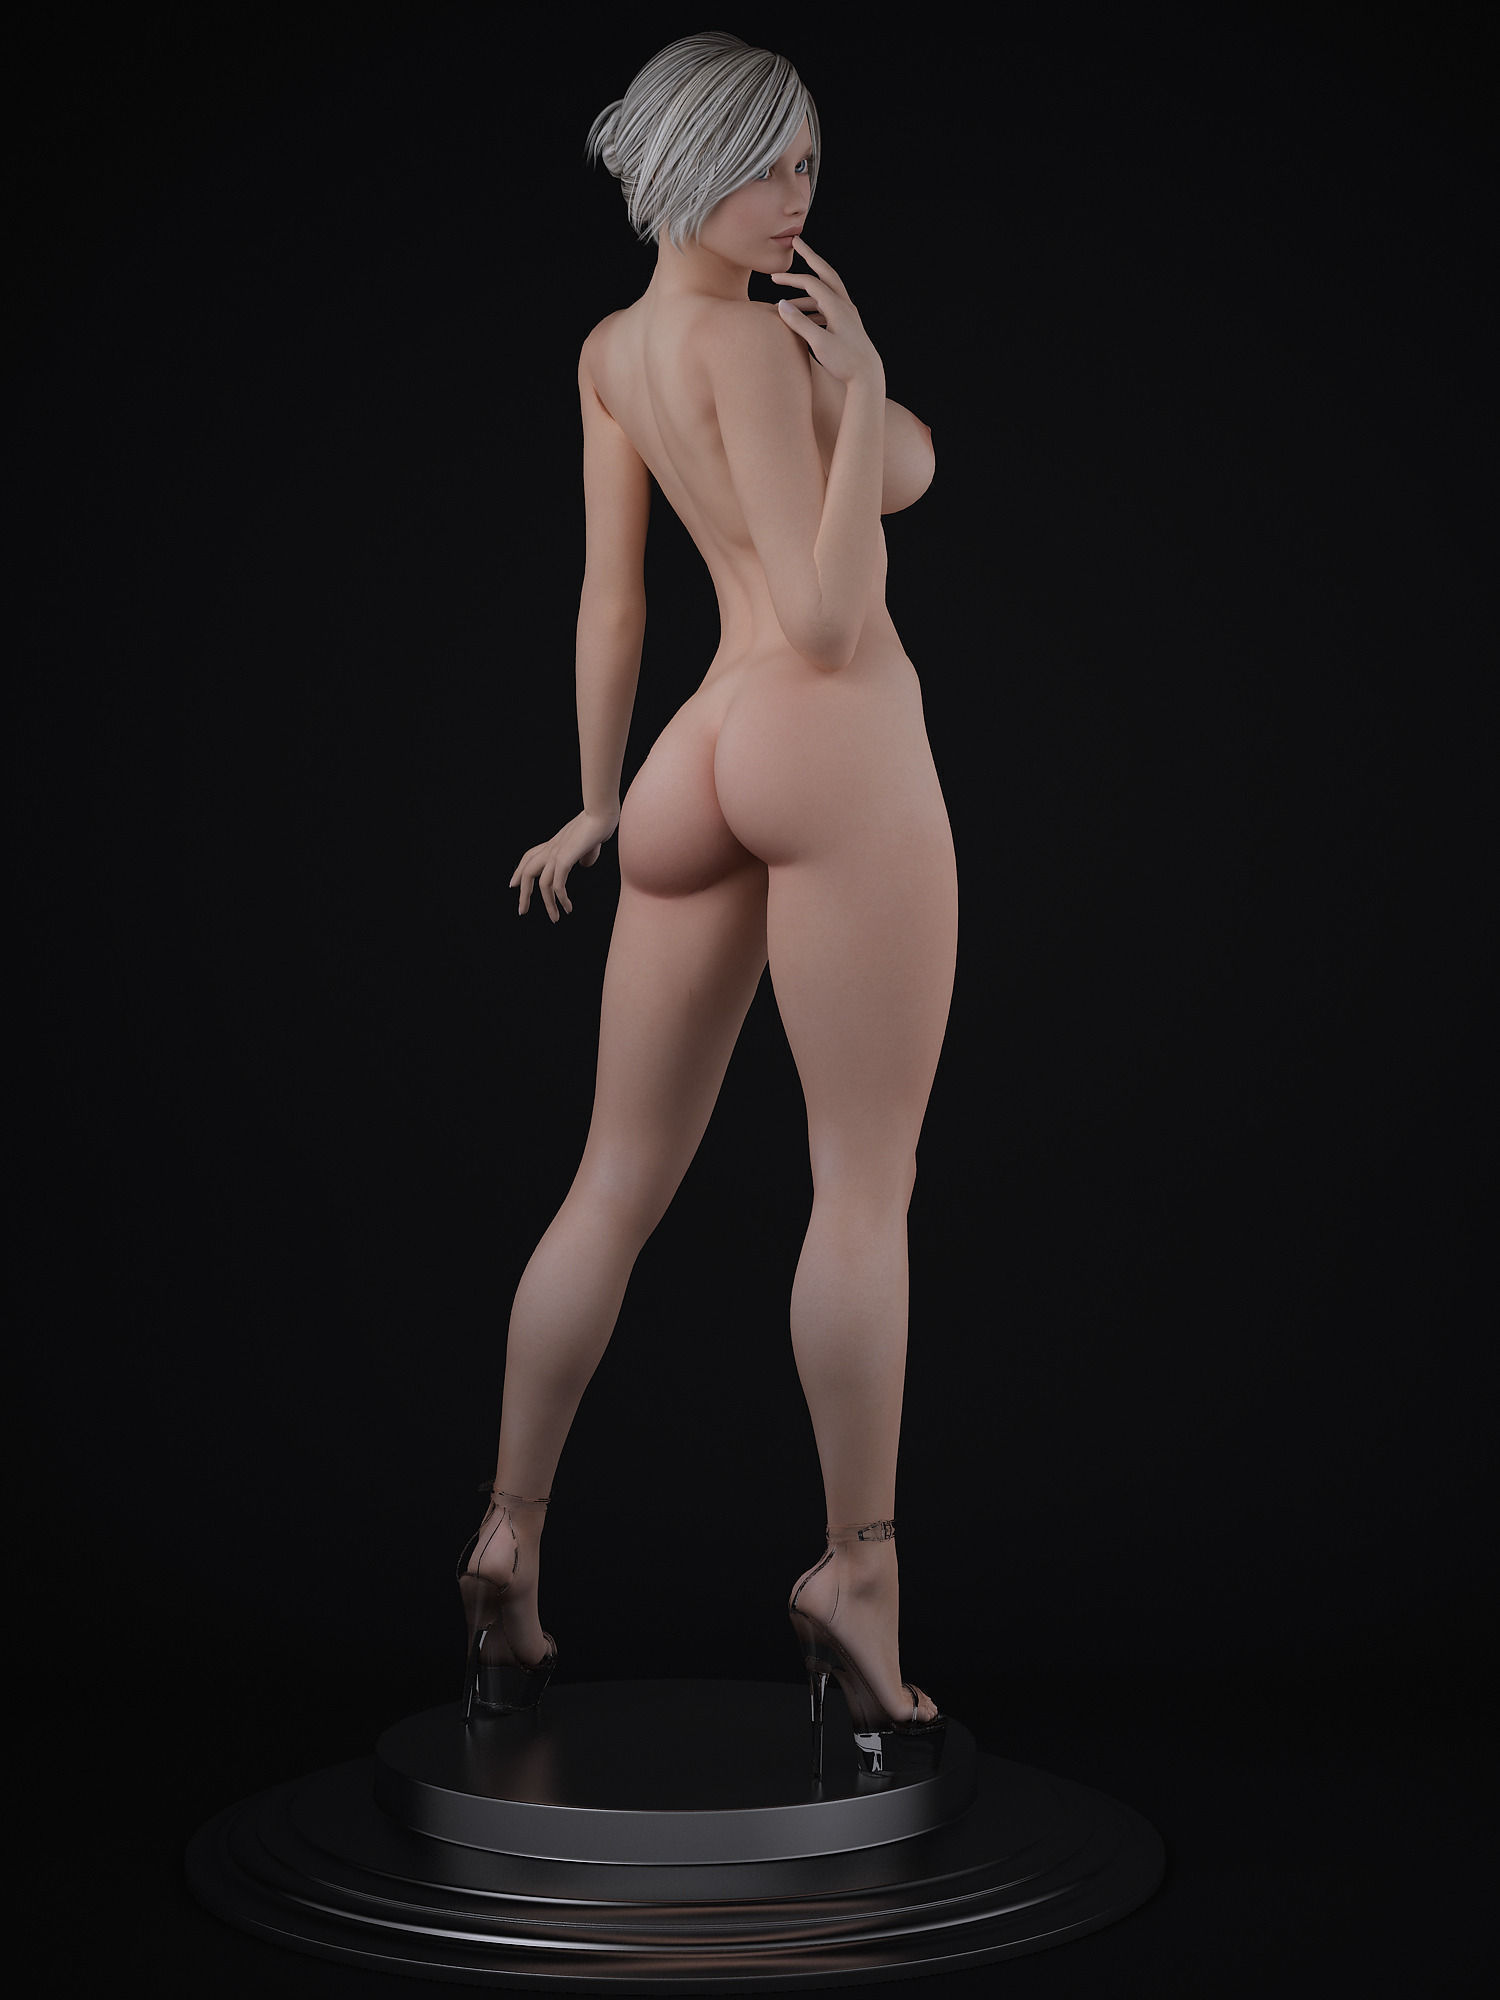 Nude Female Character 3D Model Max - Cgtradercom-6676